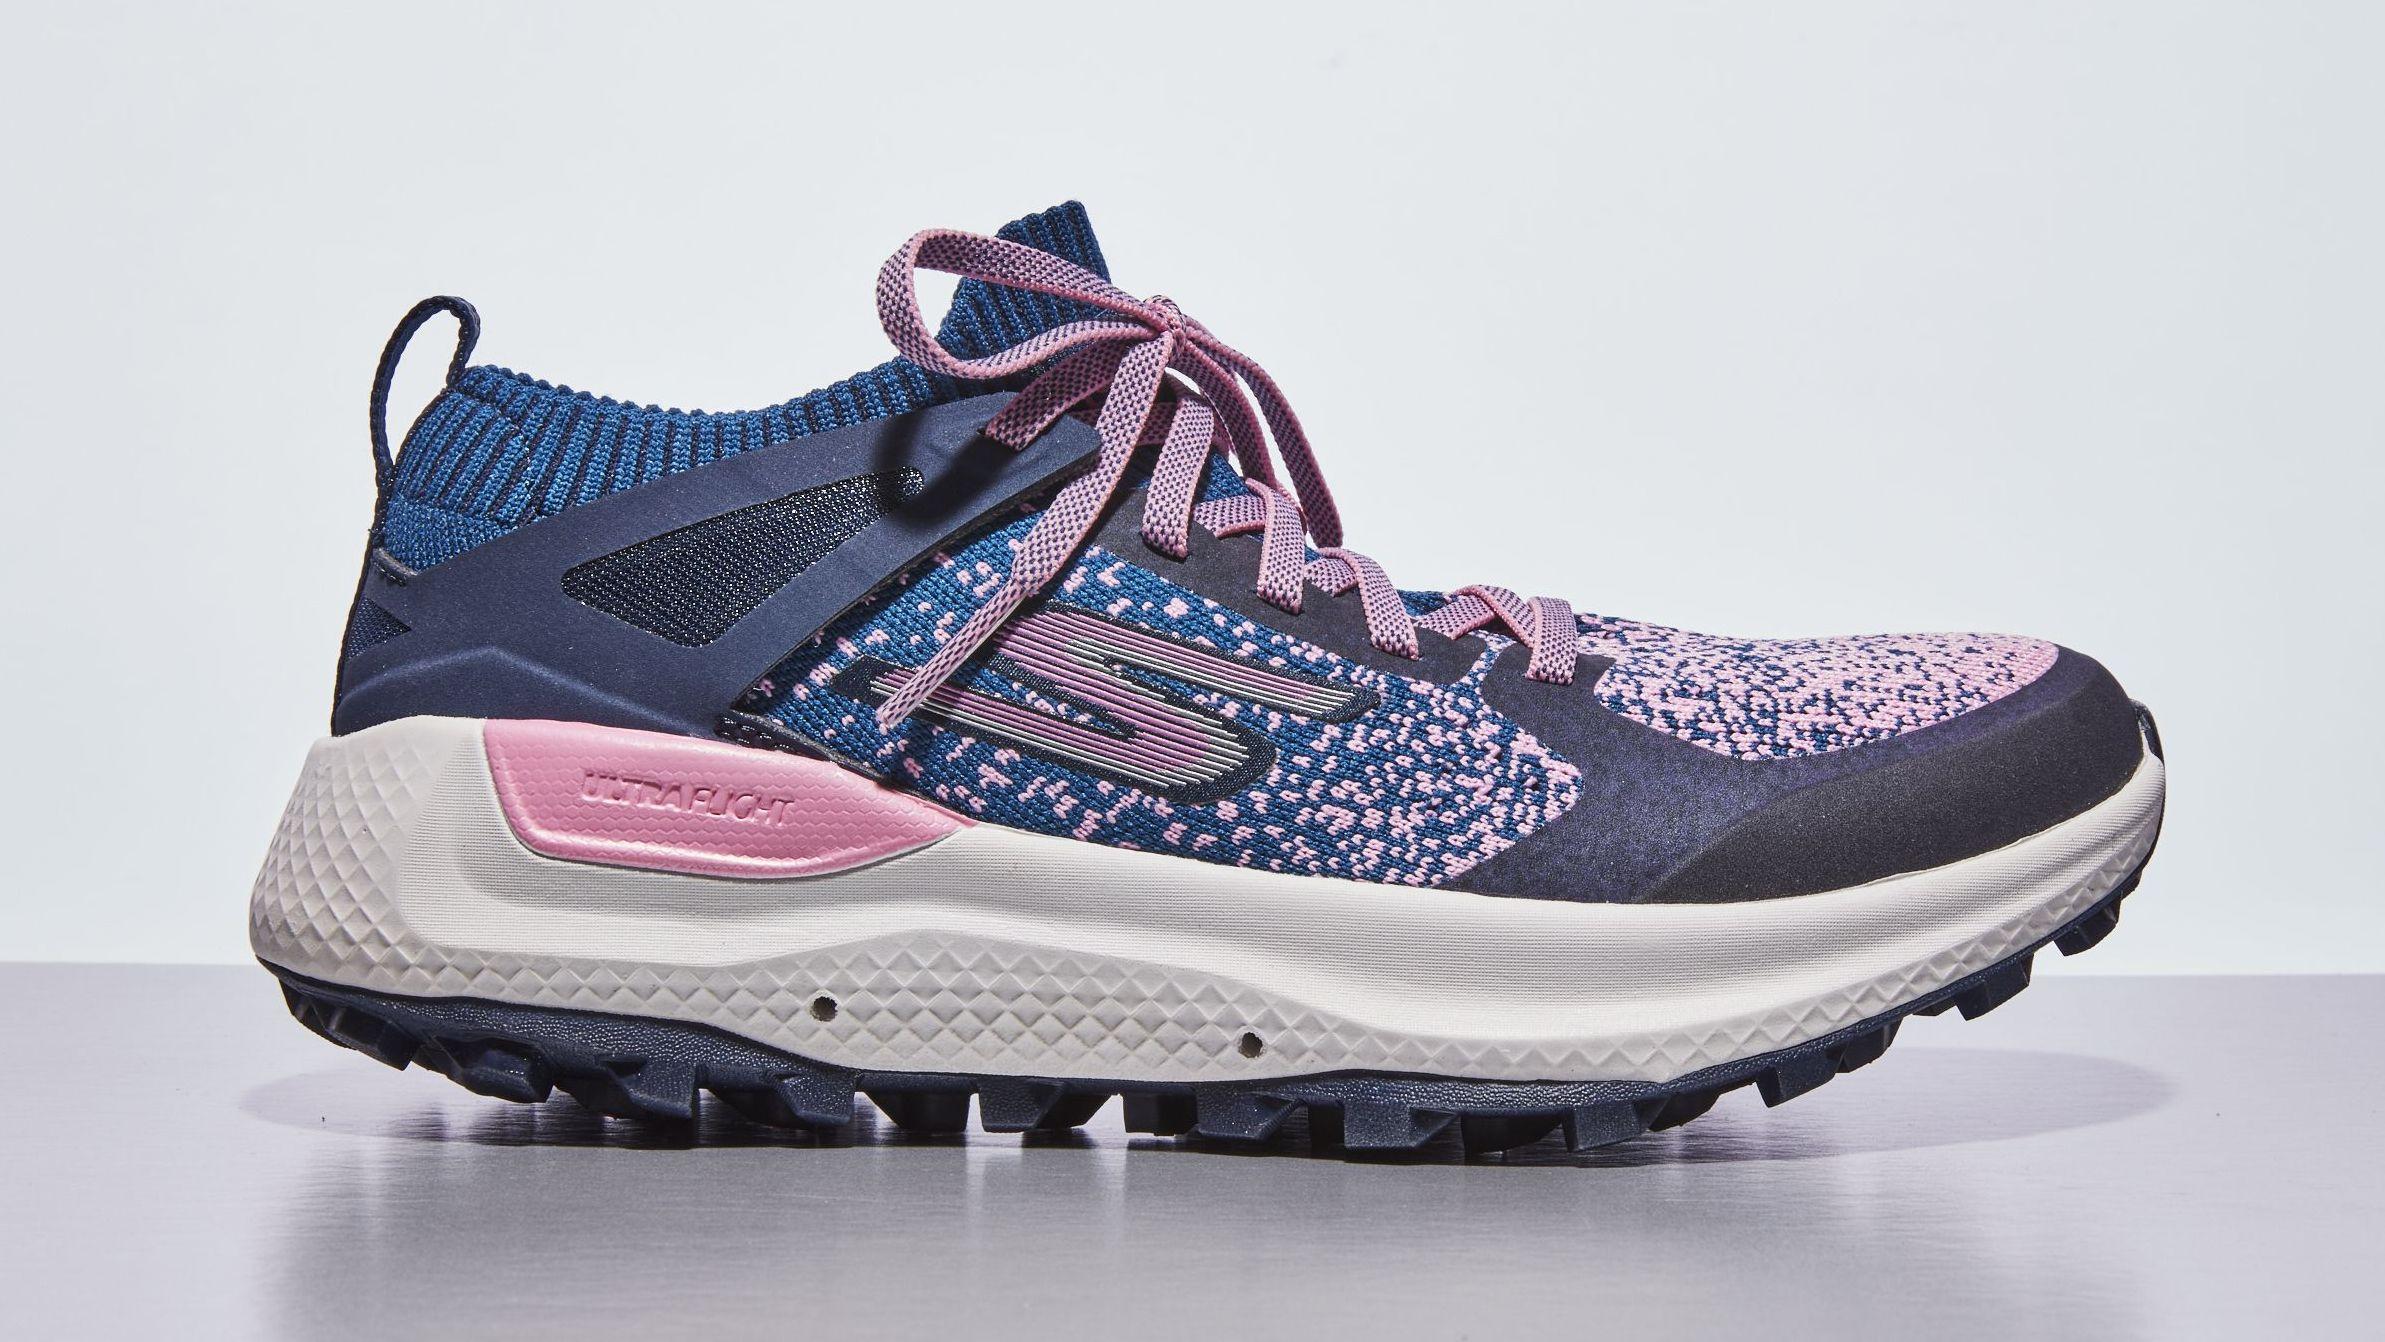 784609c3ed81 Skechers Running Shoes